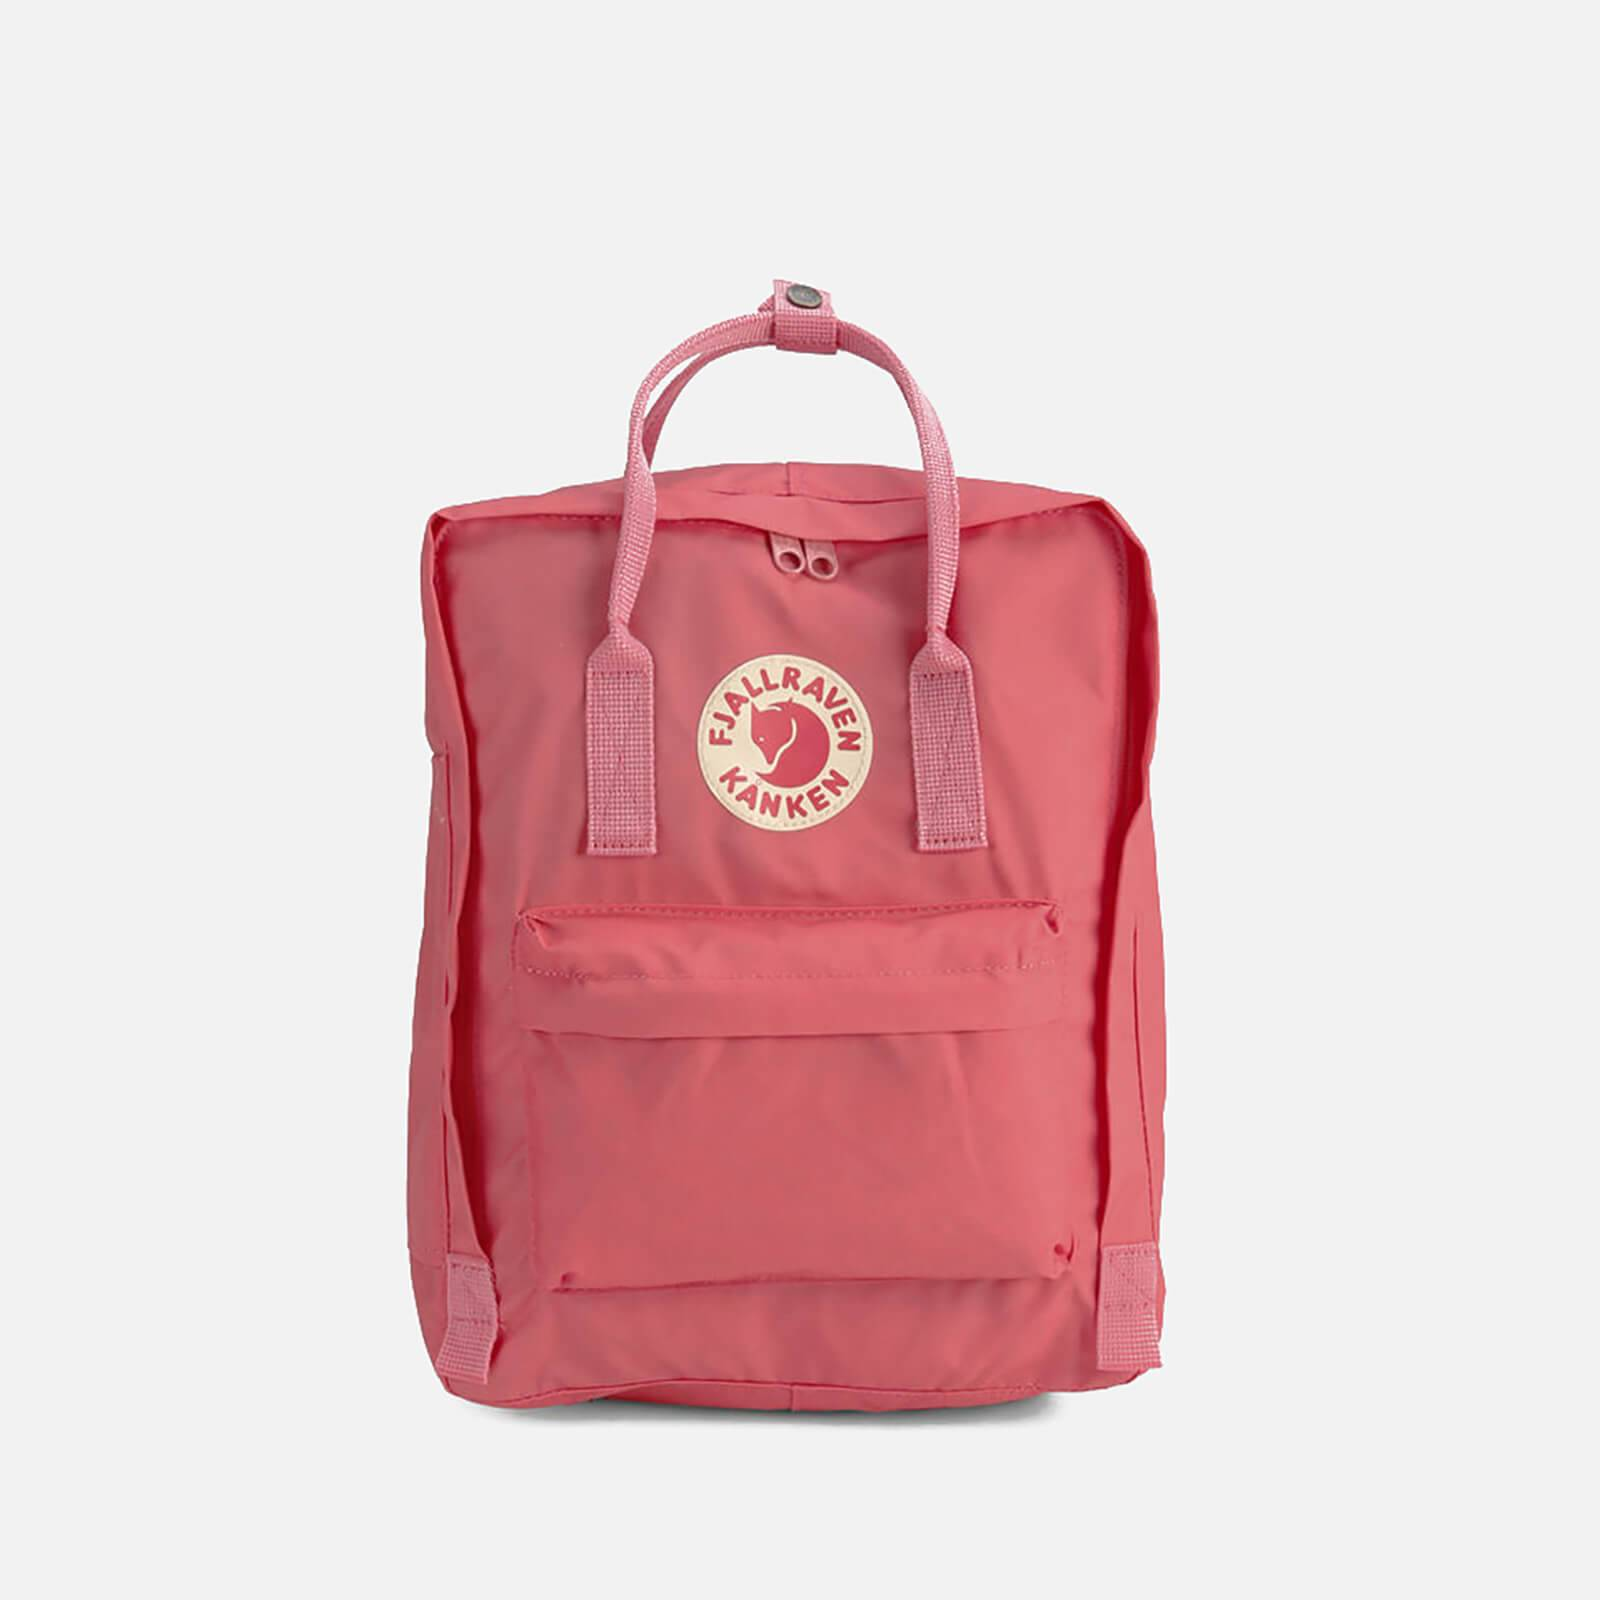 Fjallraven Kanken Backpack - Peach Pink